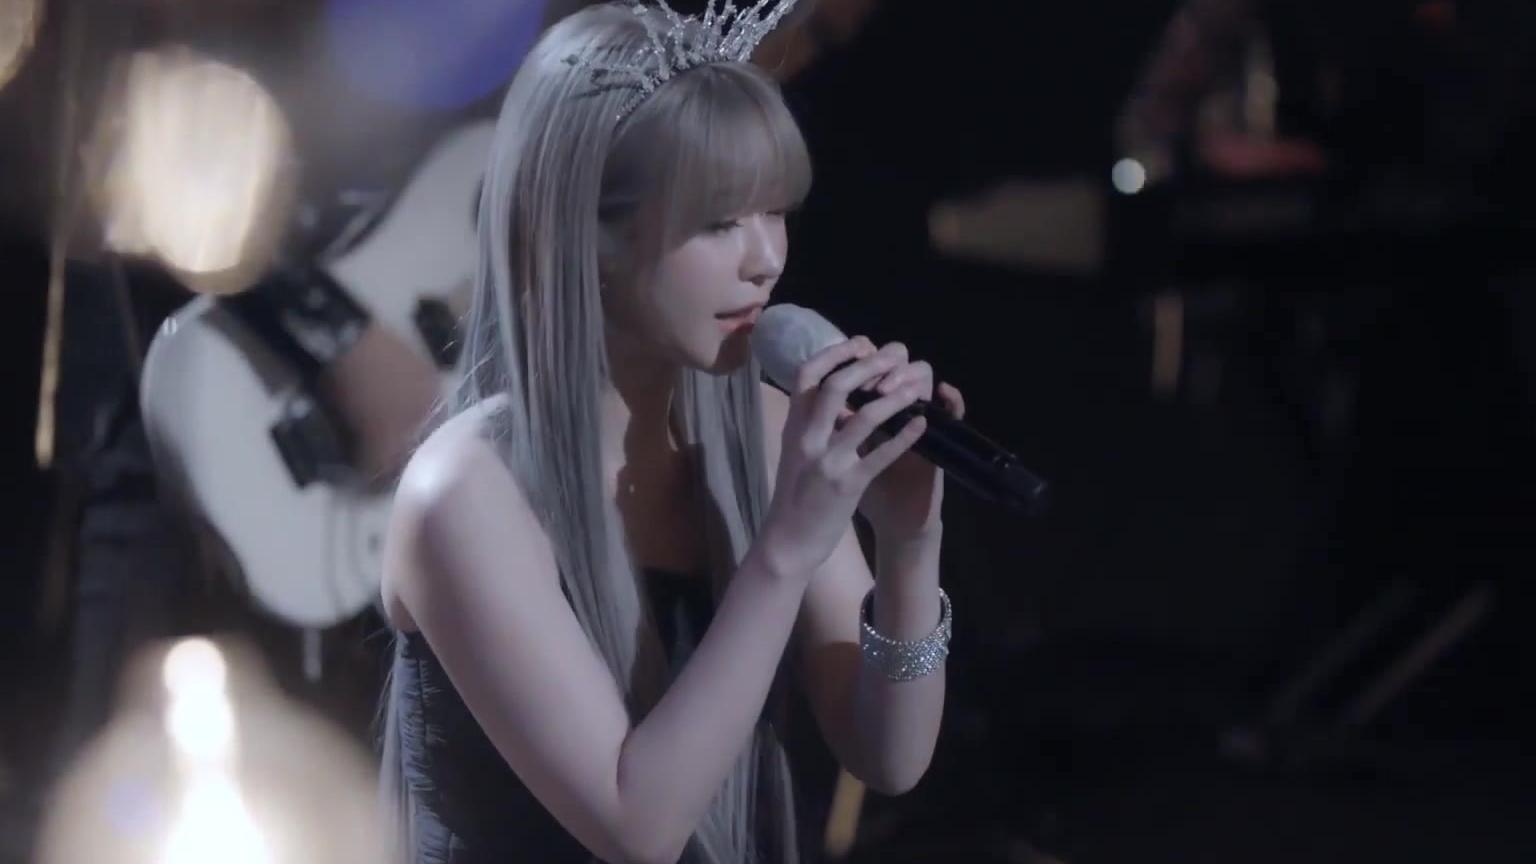 【Yurisa】韩服米哈游miHoYo崩坏3三周年线上演唱会-Yurisa部分